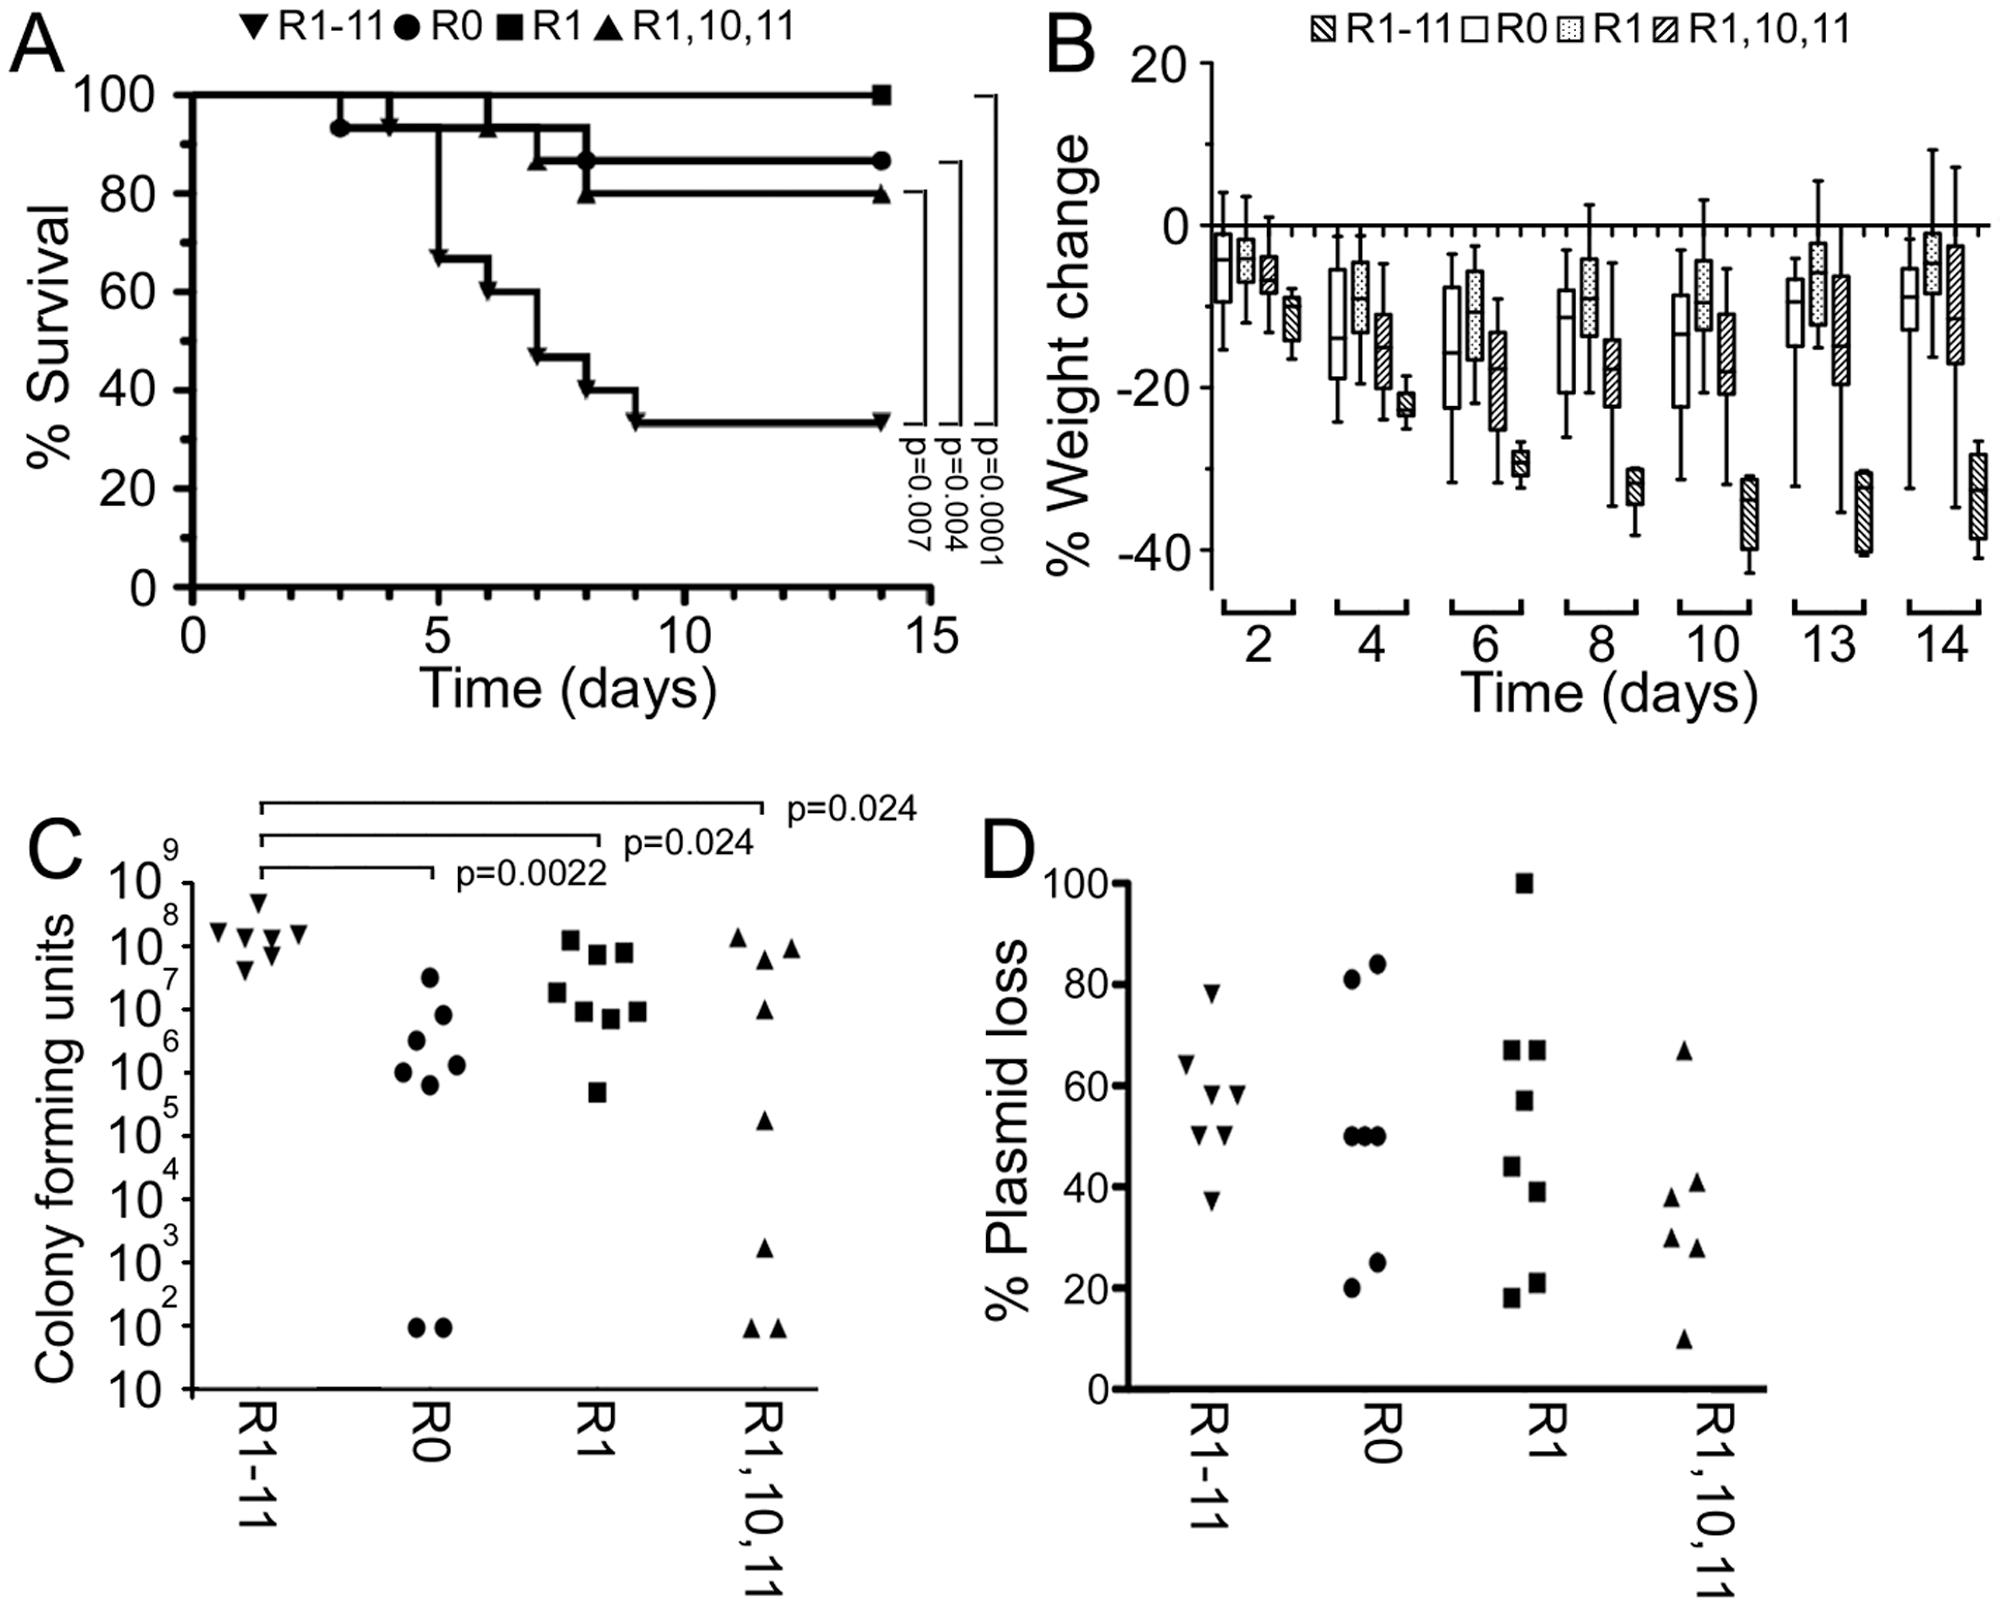 Multiple FnBRs are necessary for full virulence in a murine sepsis model.